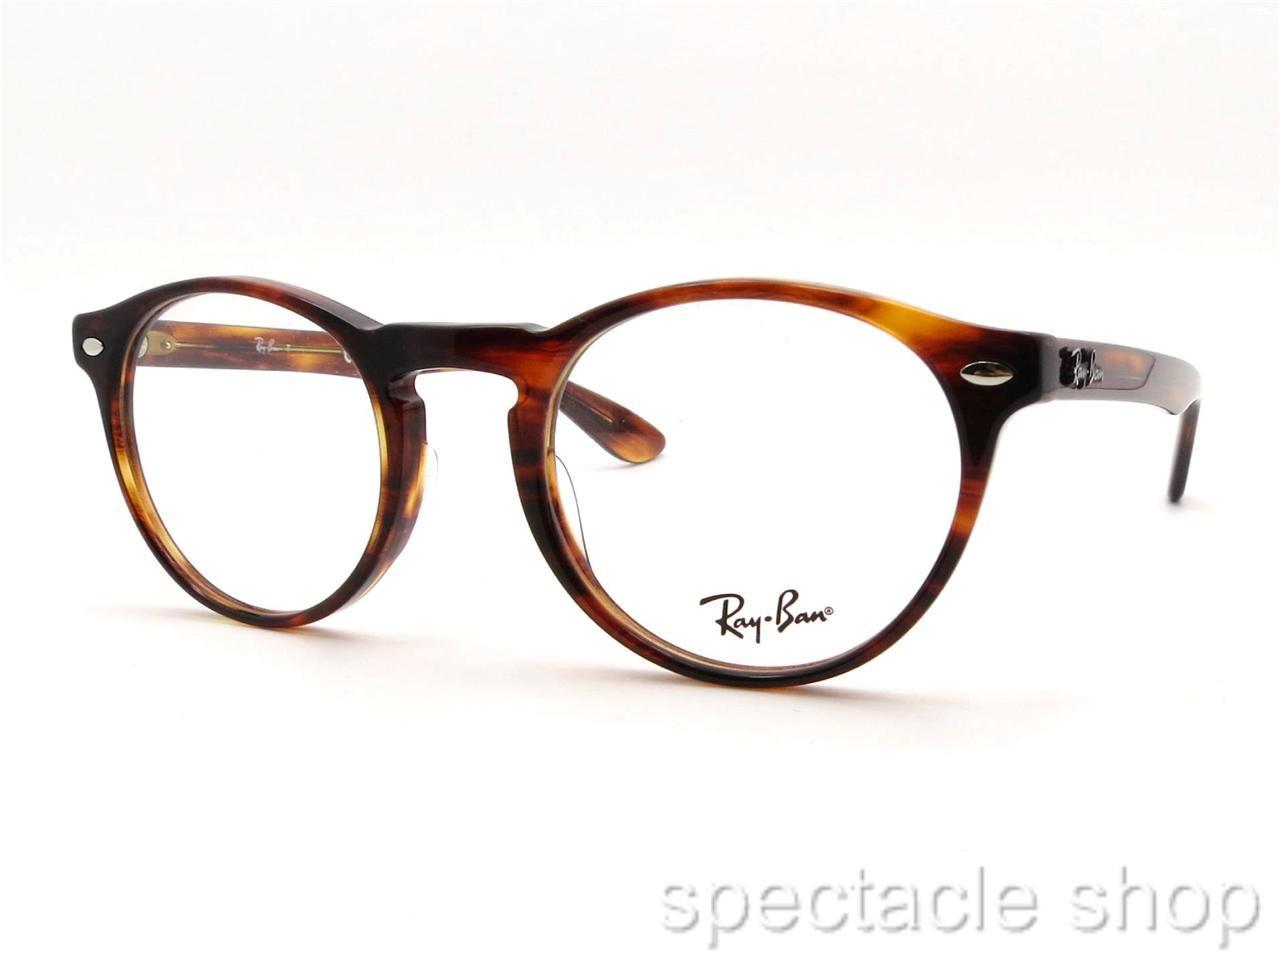 086ca16c4f Ray Ban Eyeglasses Havana Blue